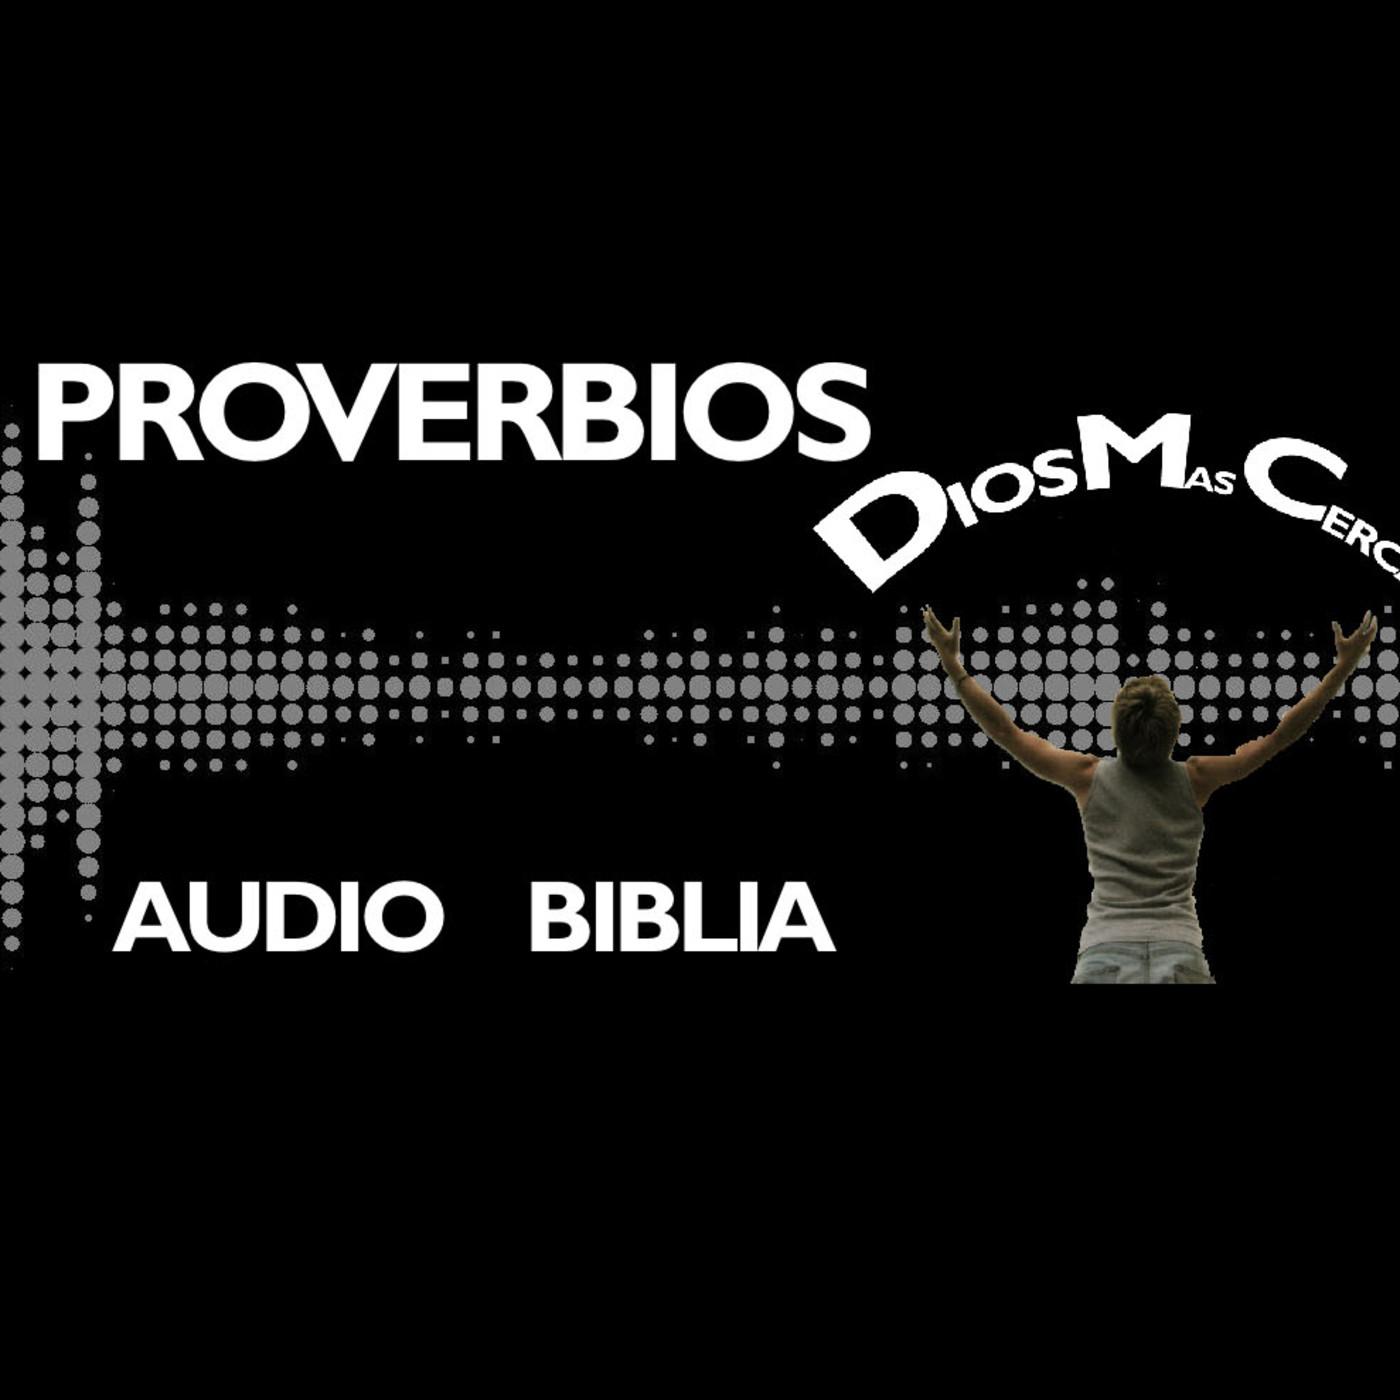 mp3 proverbios x